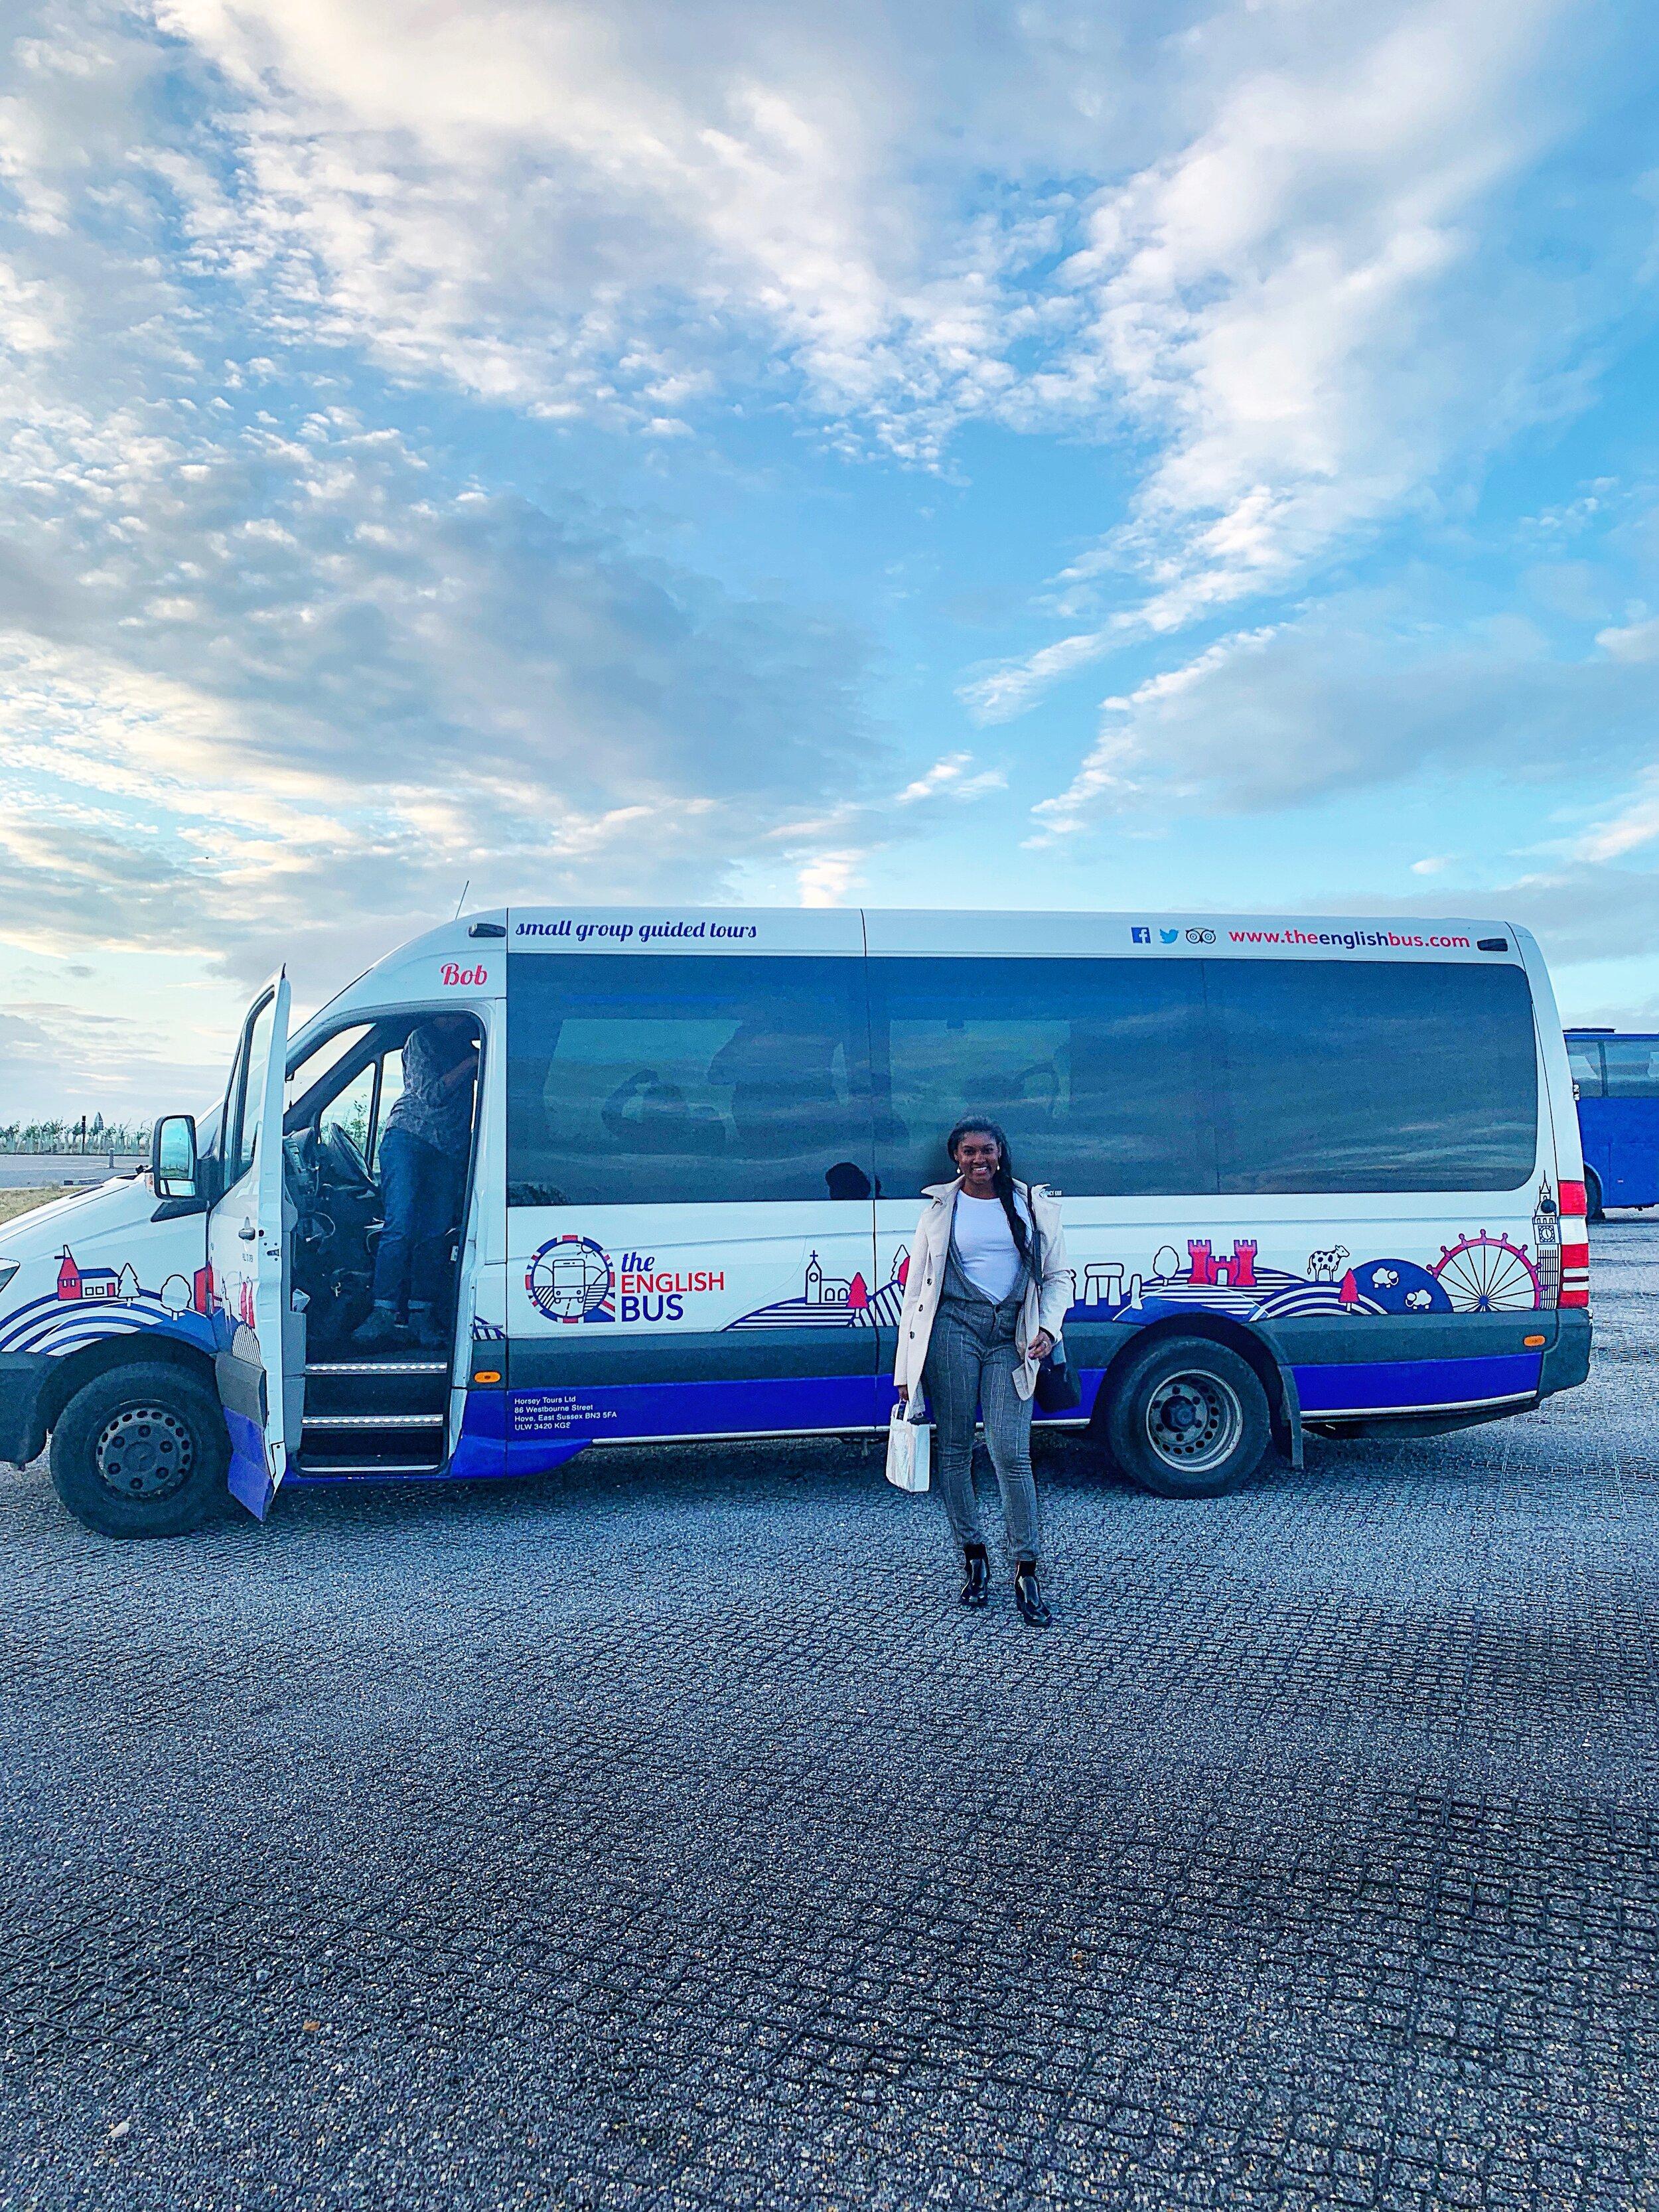 The English Bus